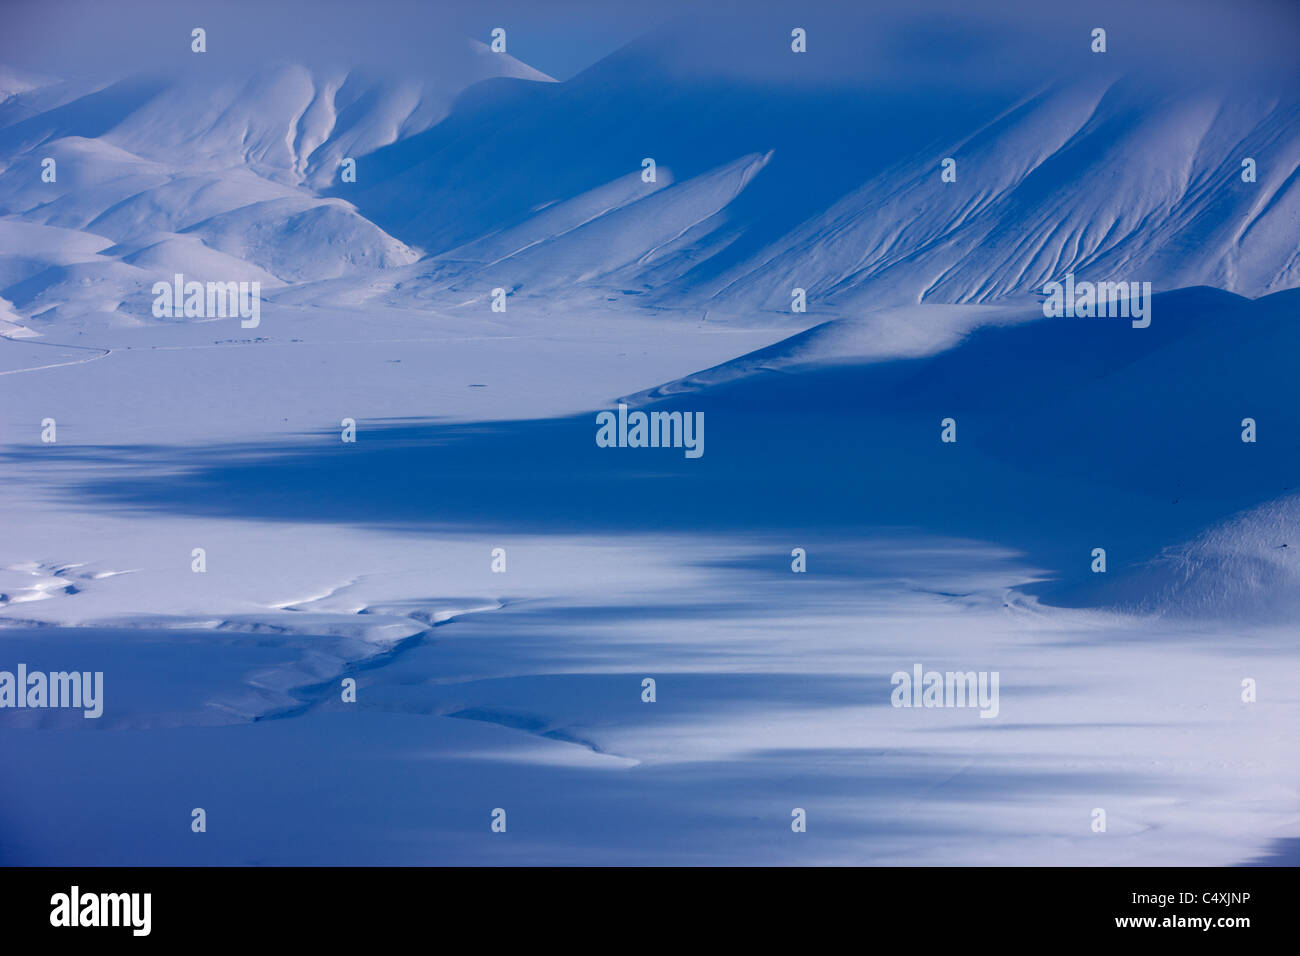 das Piano Grande im Winter, Nationalpark Monti Sibillini, Umbrien, Italien Stockbild